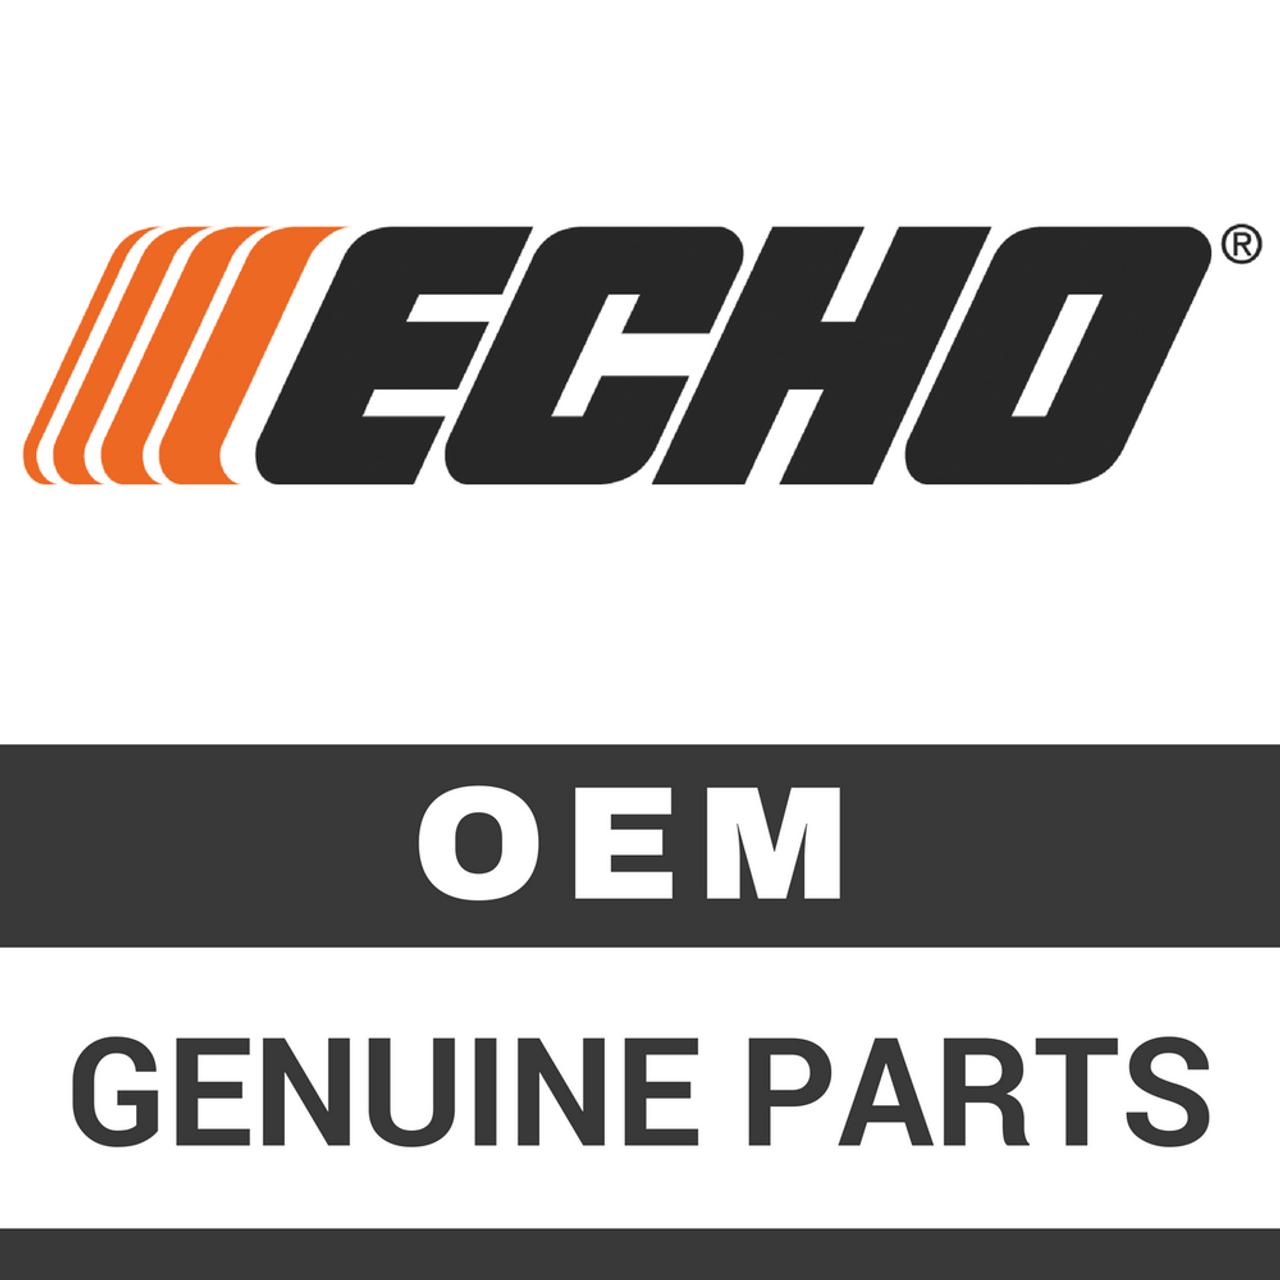 Genuine echo Part SCREW 3 X 6 90024103006